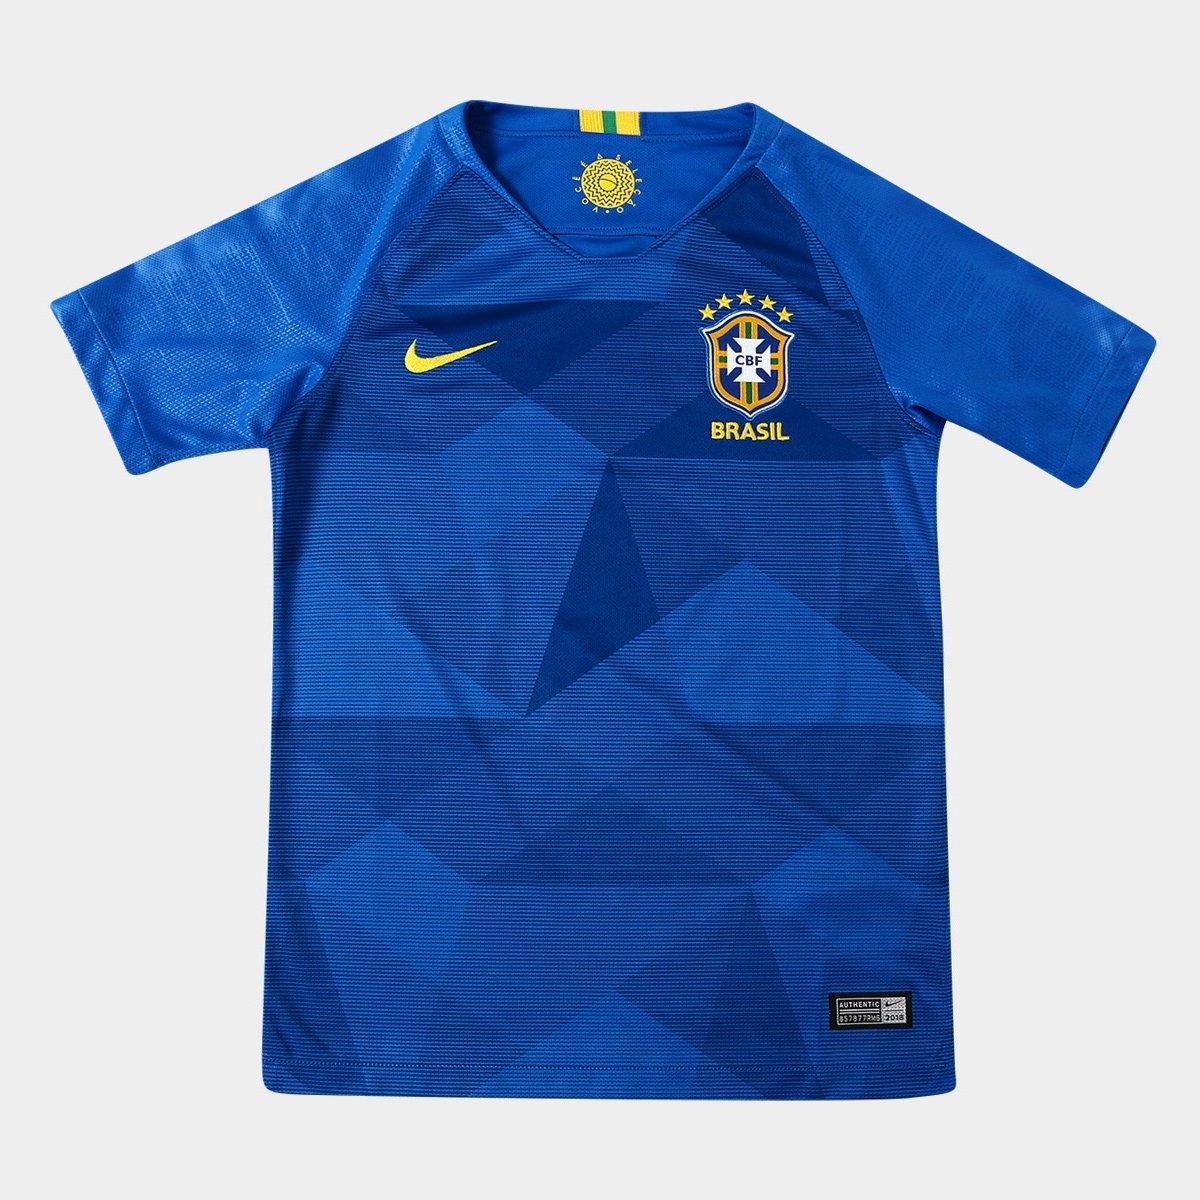 ... Camisa Seleção Brasil Juvenil II 2018 nº 9 G. Jesus - Torcedor Nike ... 4c64b8165b9cf